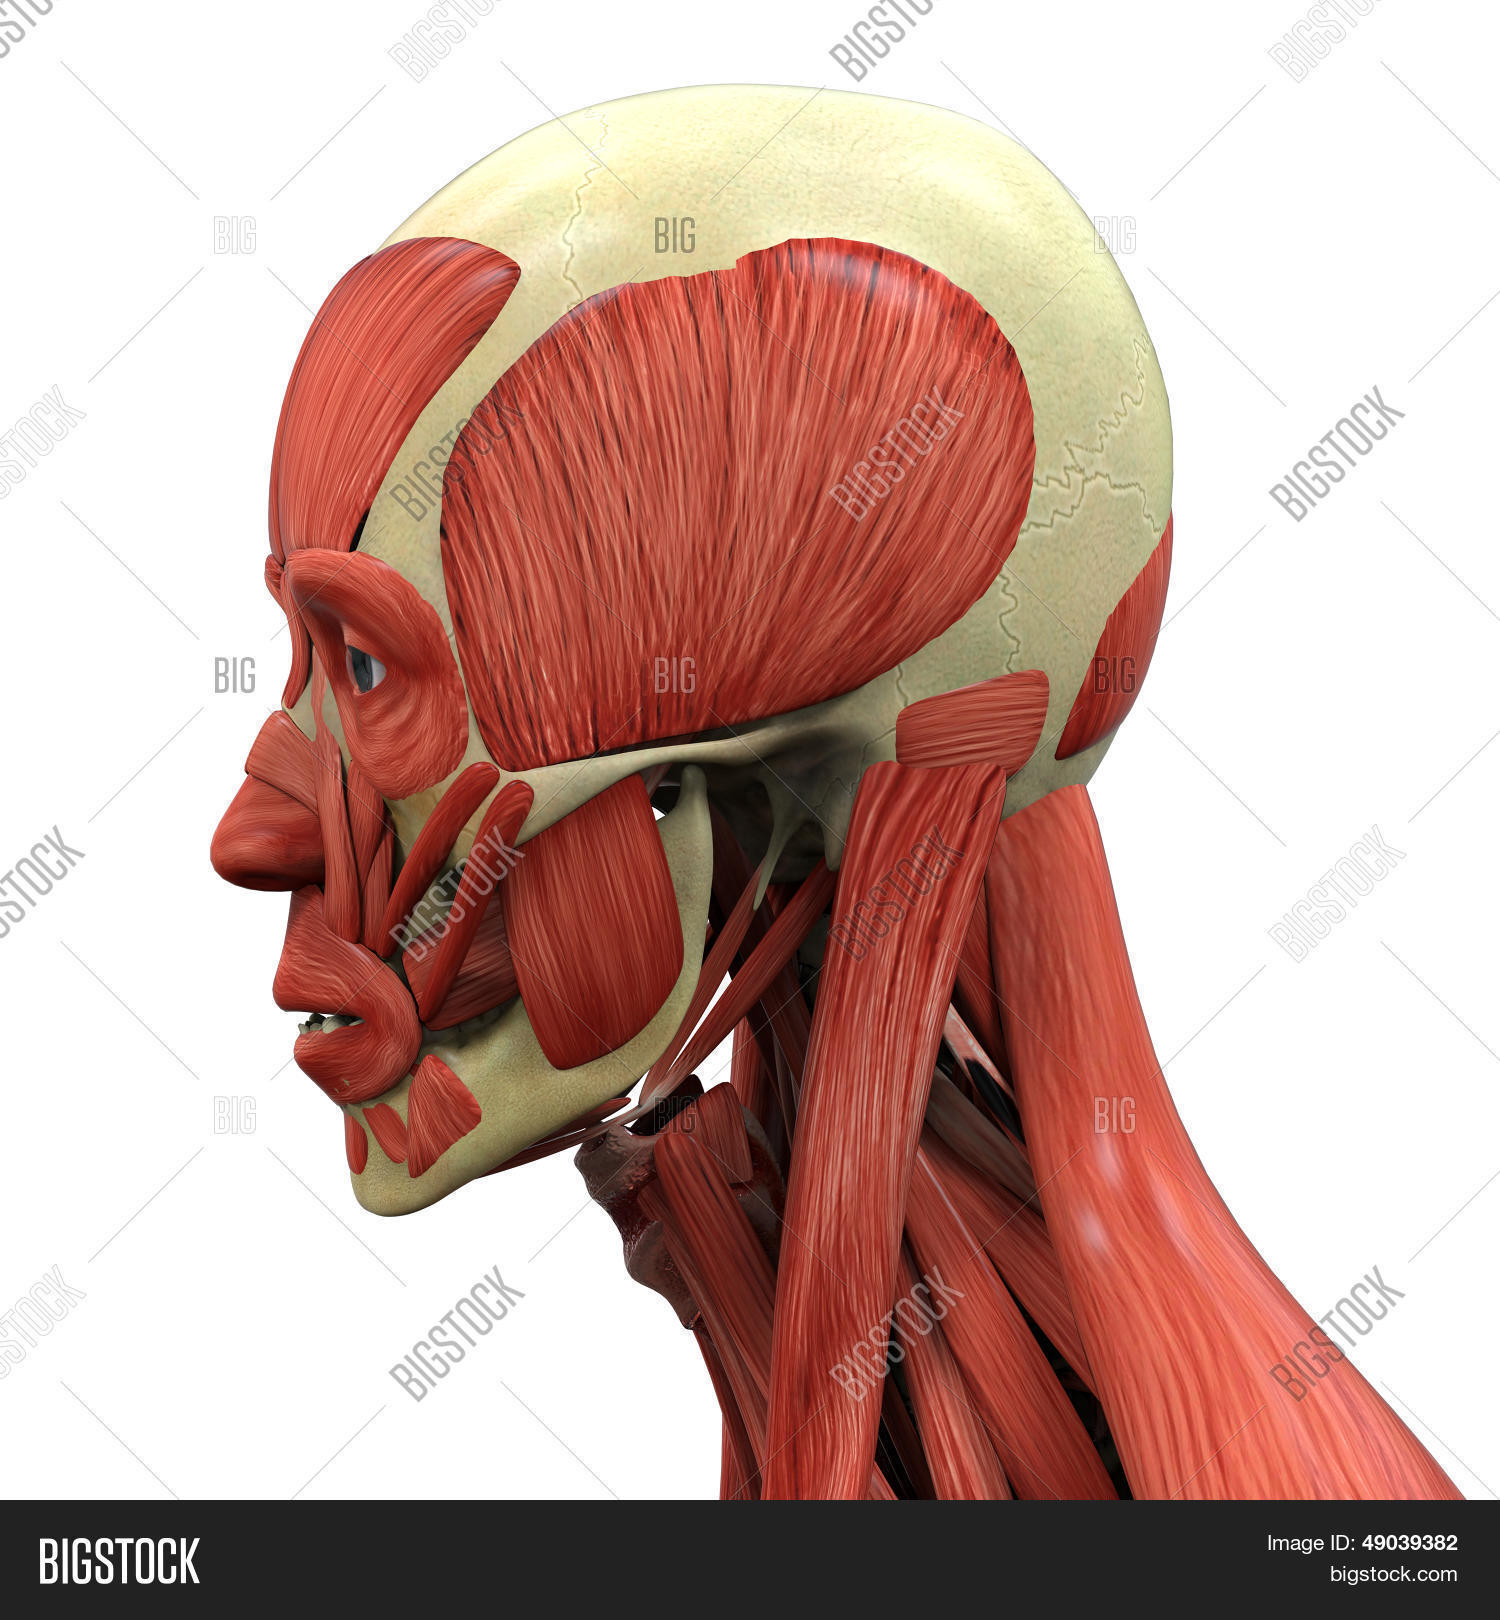 Human Face Anatomy Image Photo Free Trial Bigstock